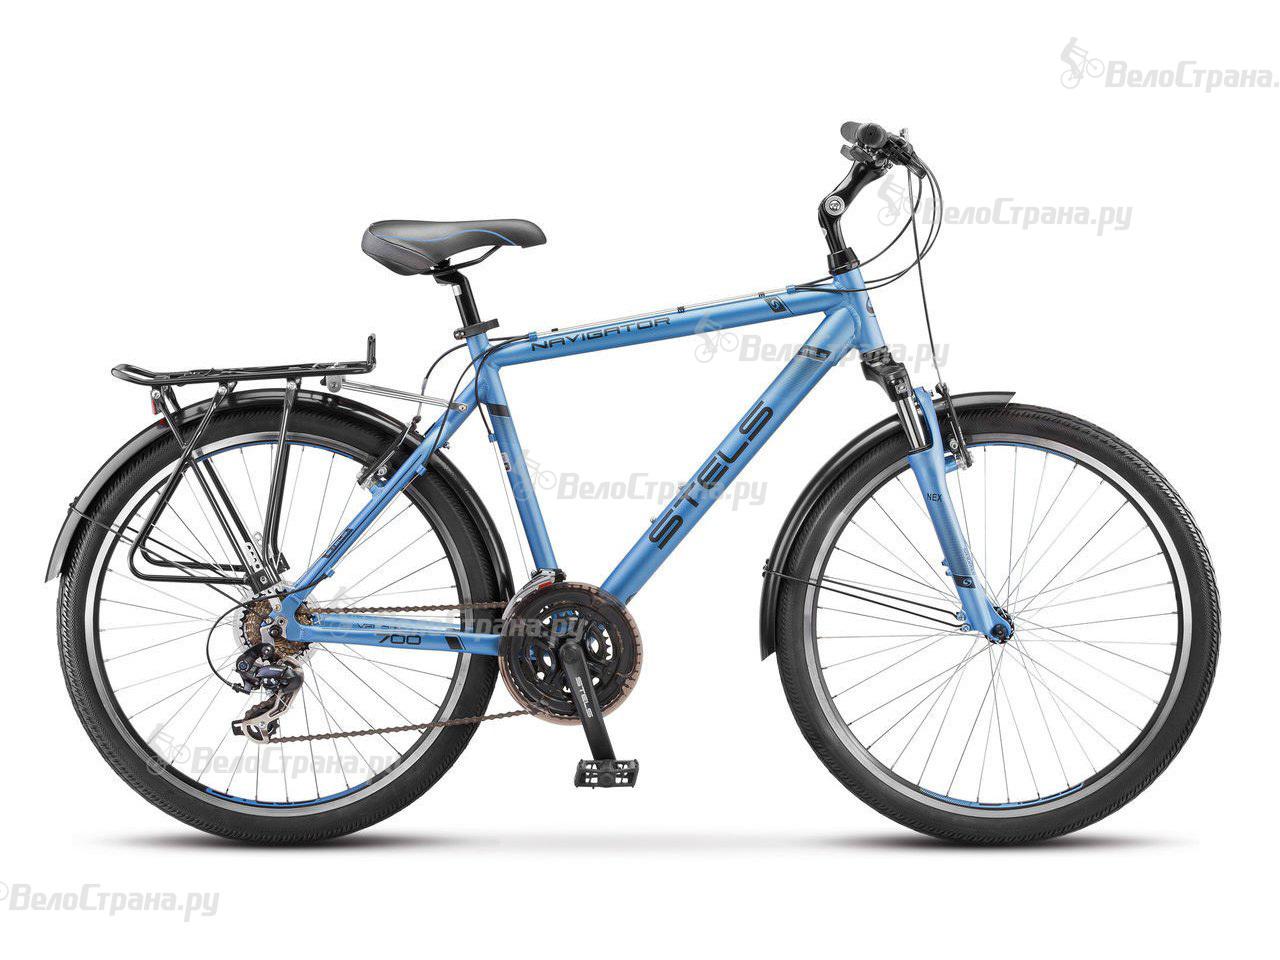 Велосипед Stels Navigator 700 (2016) велосипед stels navigator 700 2016